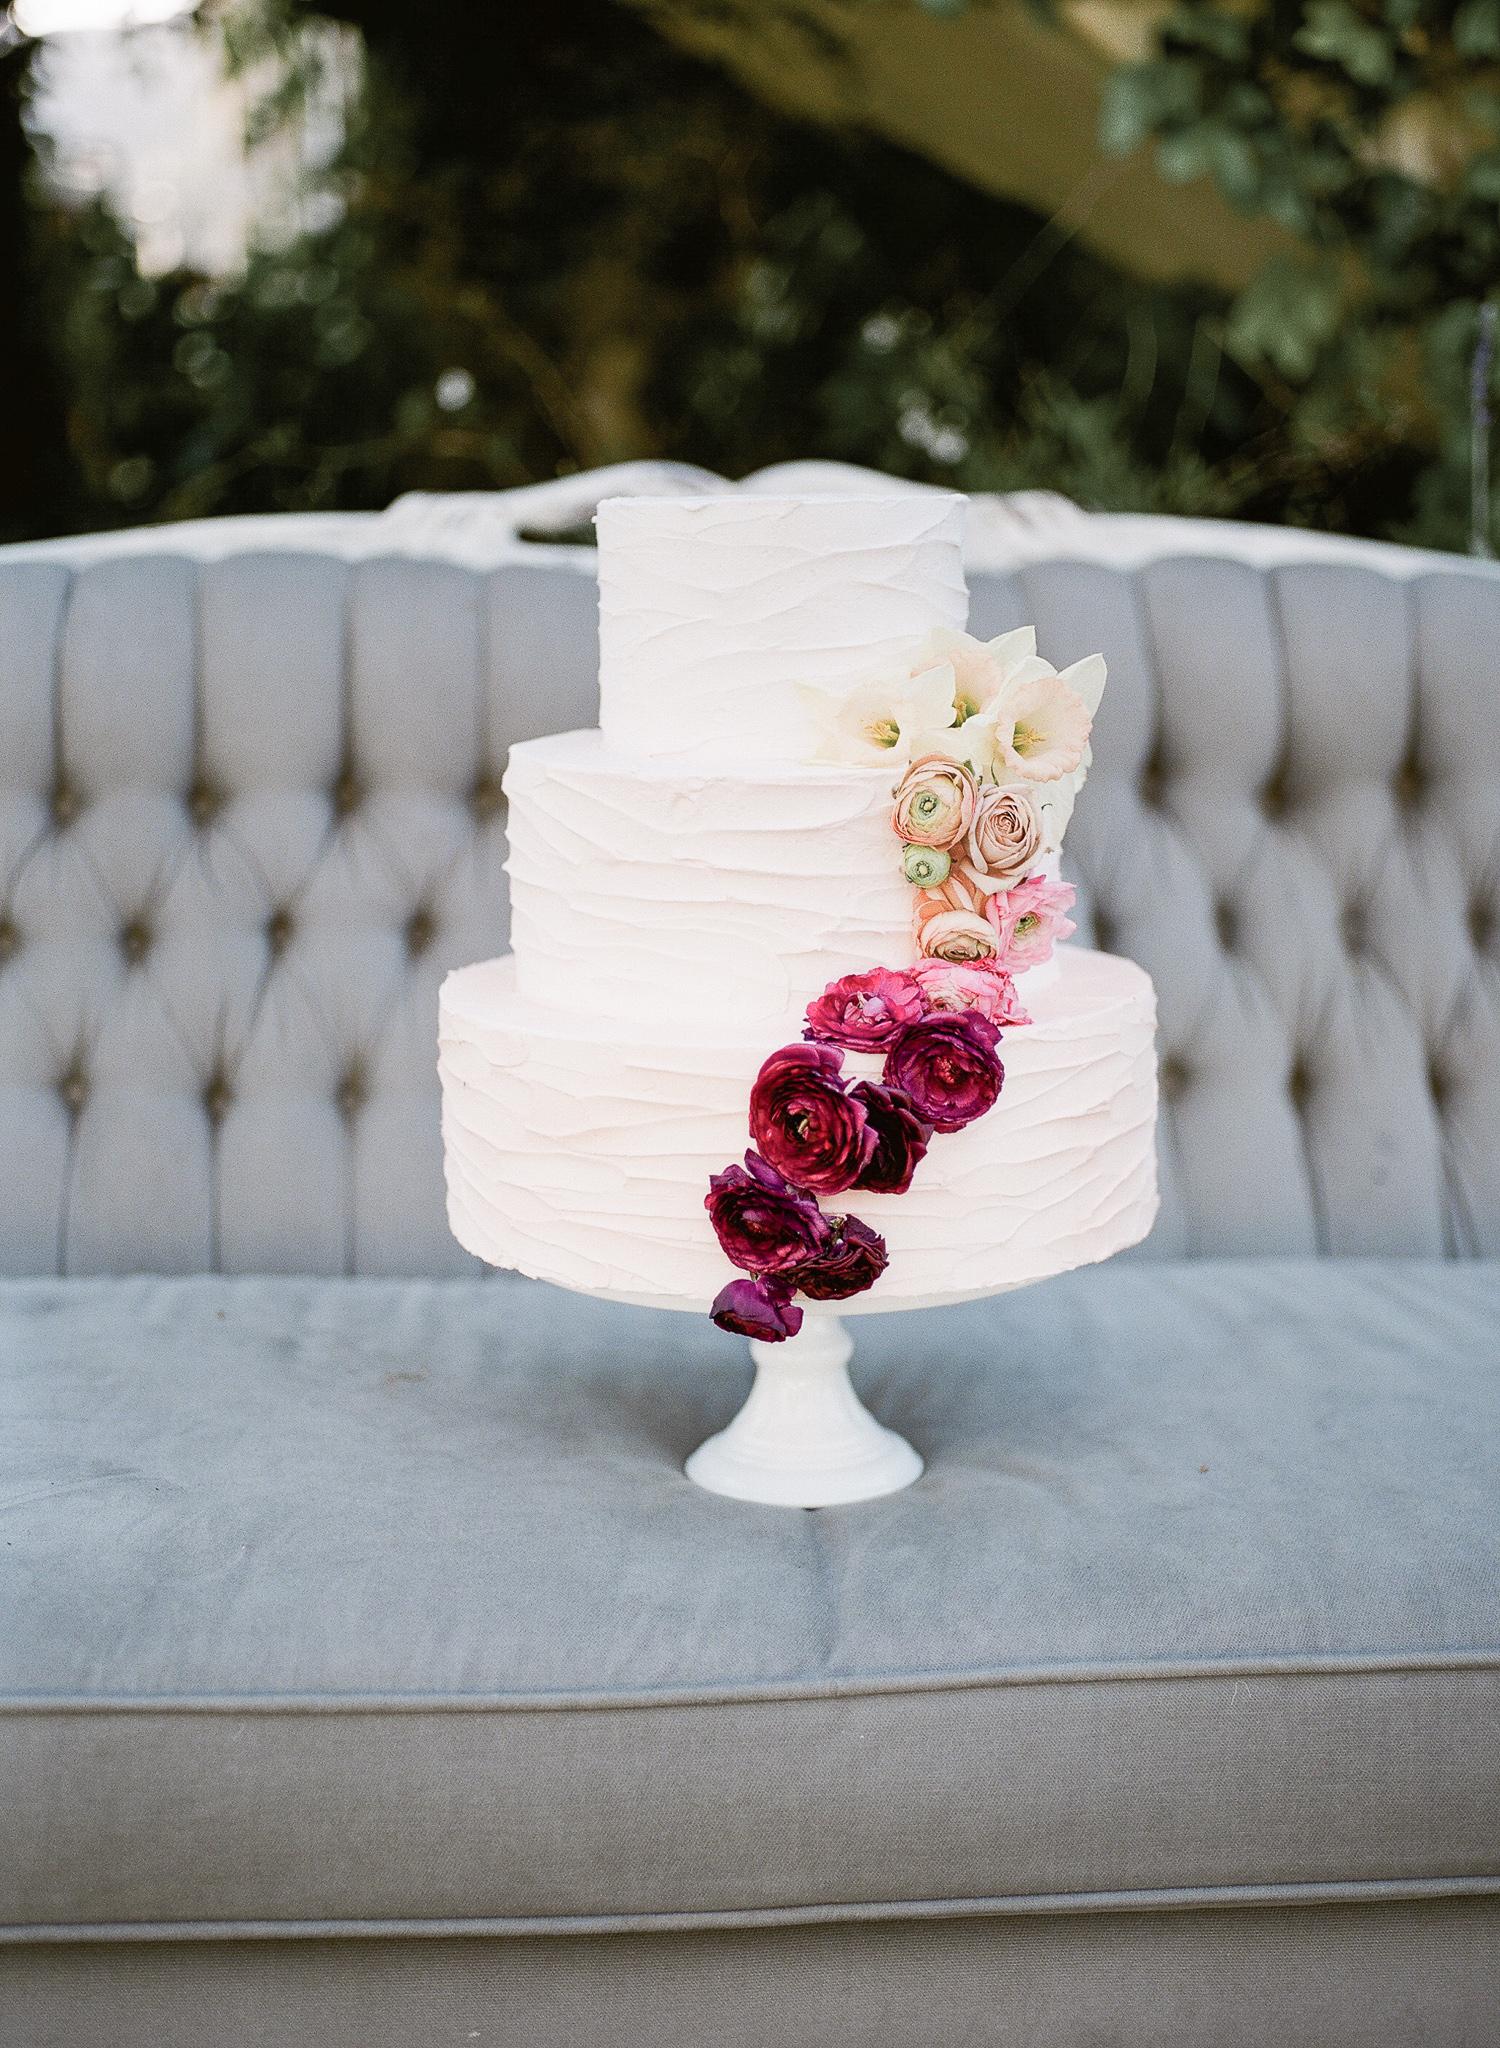 MeghanElise Photography - Shootout - Wedding Inspiration - 000090360003.jpg